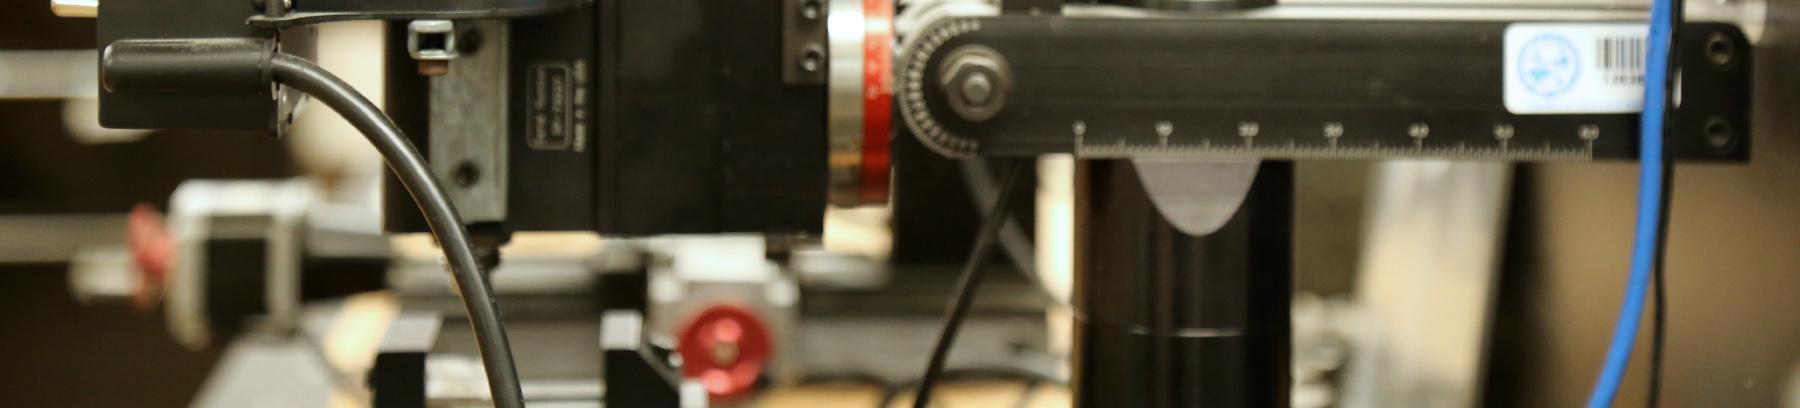 Close-up of digital fabrication lab tools.